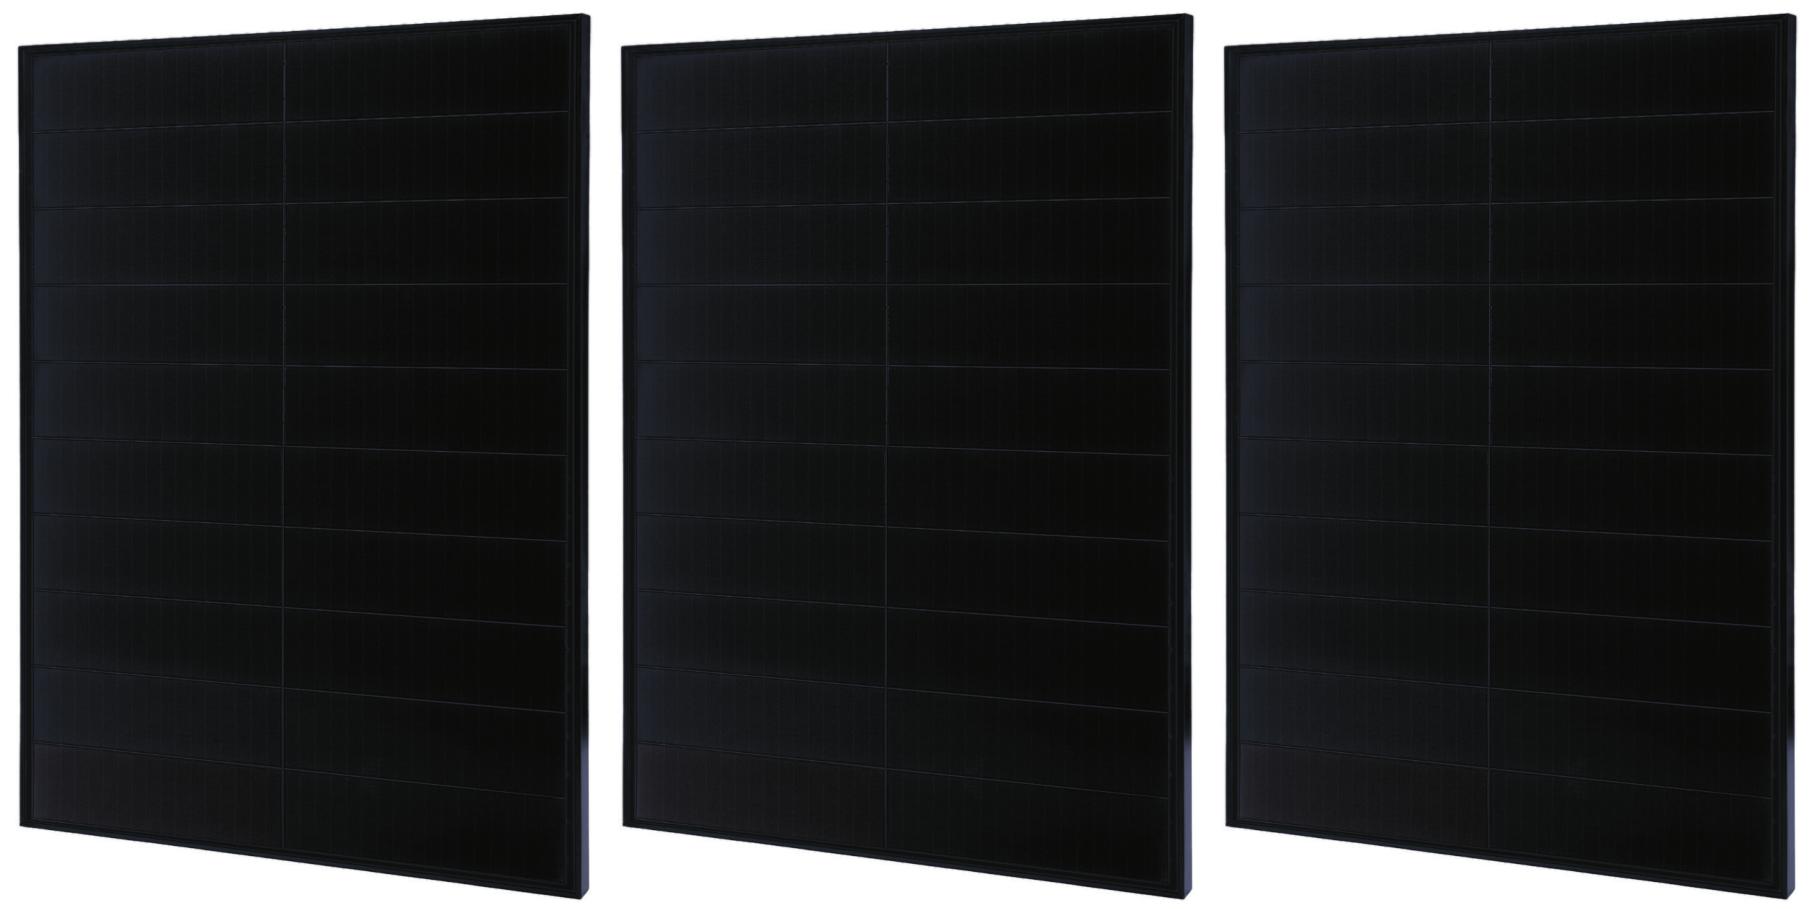 Solaria State-of-the-Art 400 Watt PowerXT Panel | YSG Solar